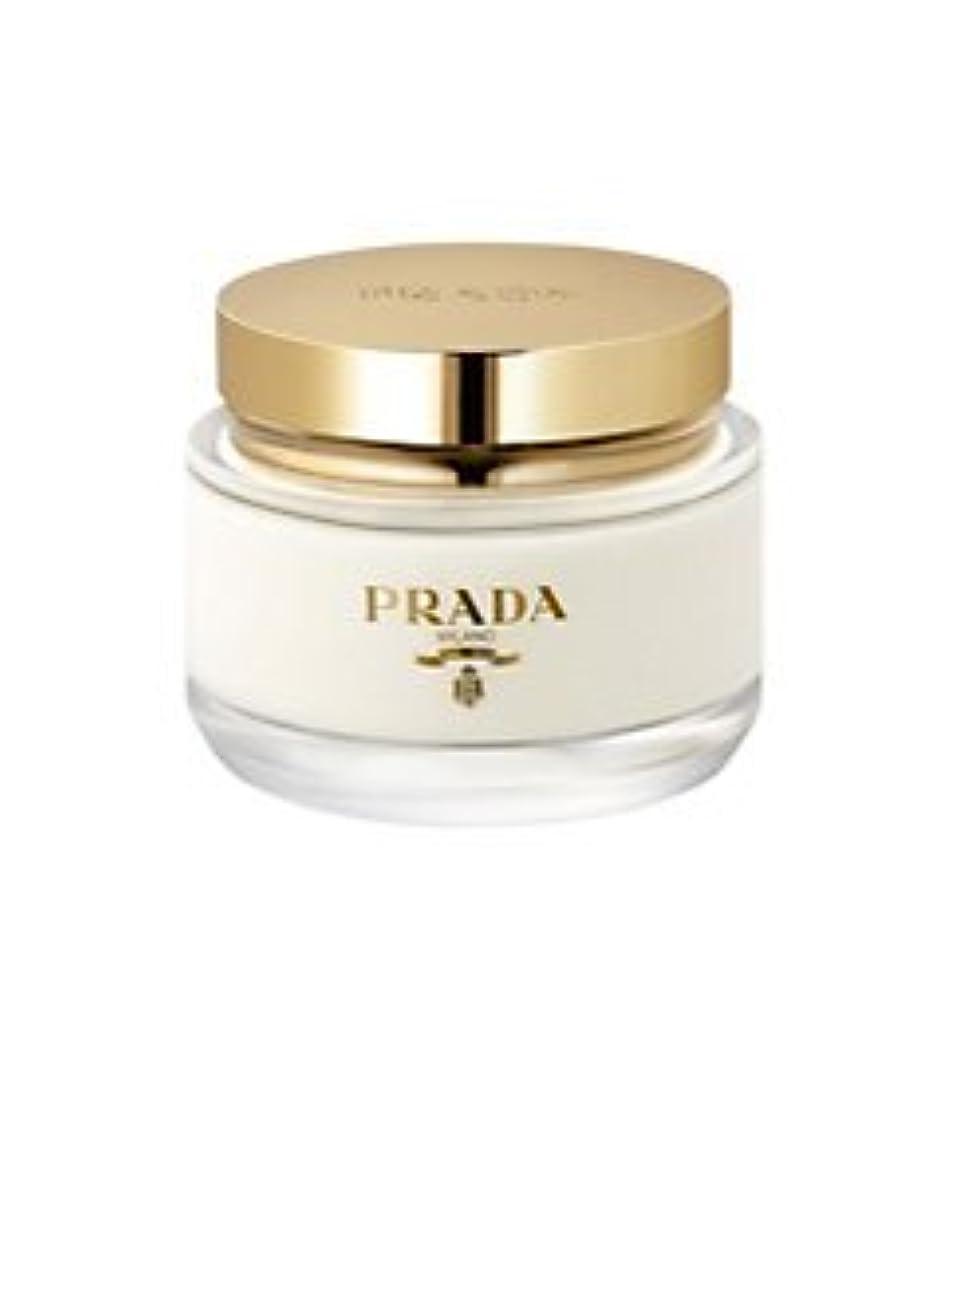 La Femme Prada (ラ フェム プラダ) 6.7 oz (200ml) Body Cream for Women